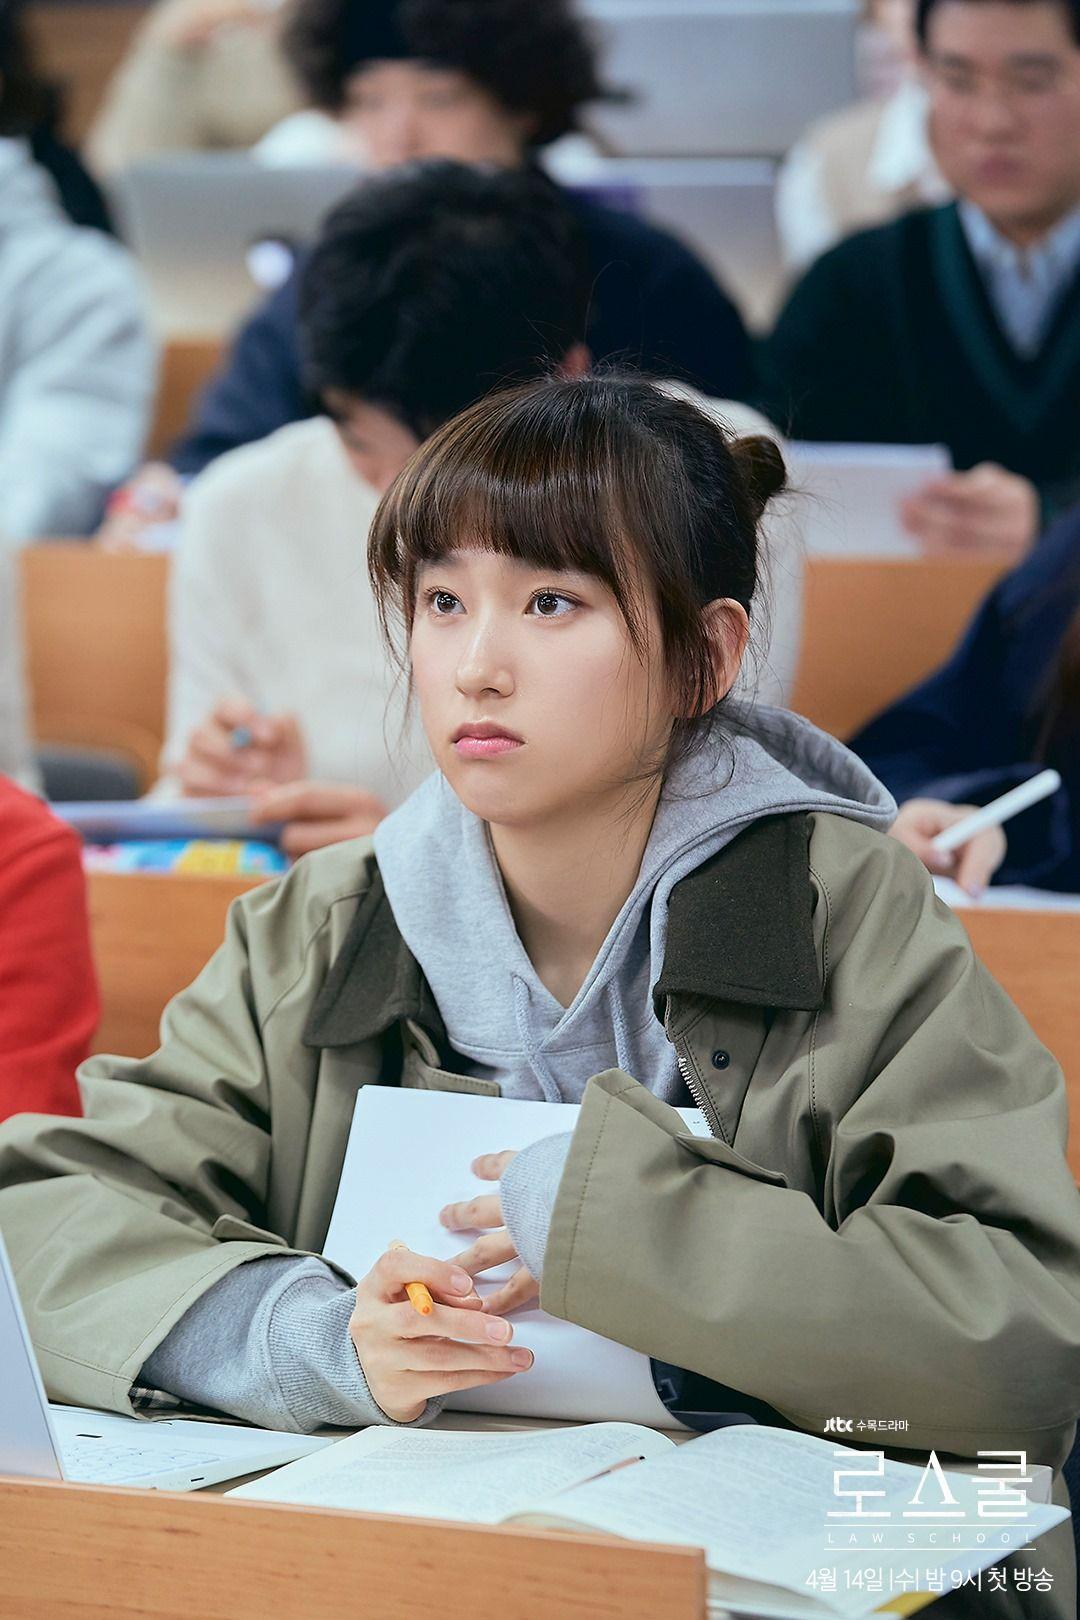 pemain Law School, Ryu Hye Young